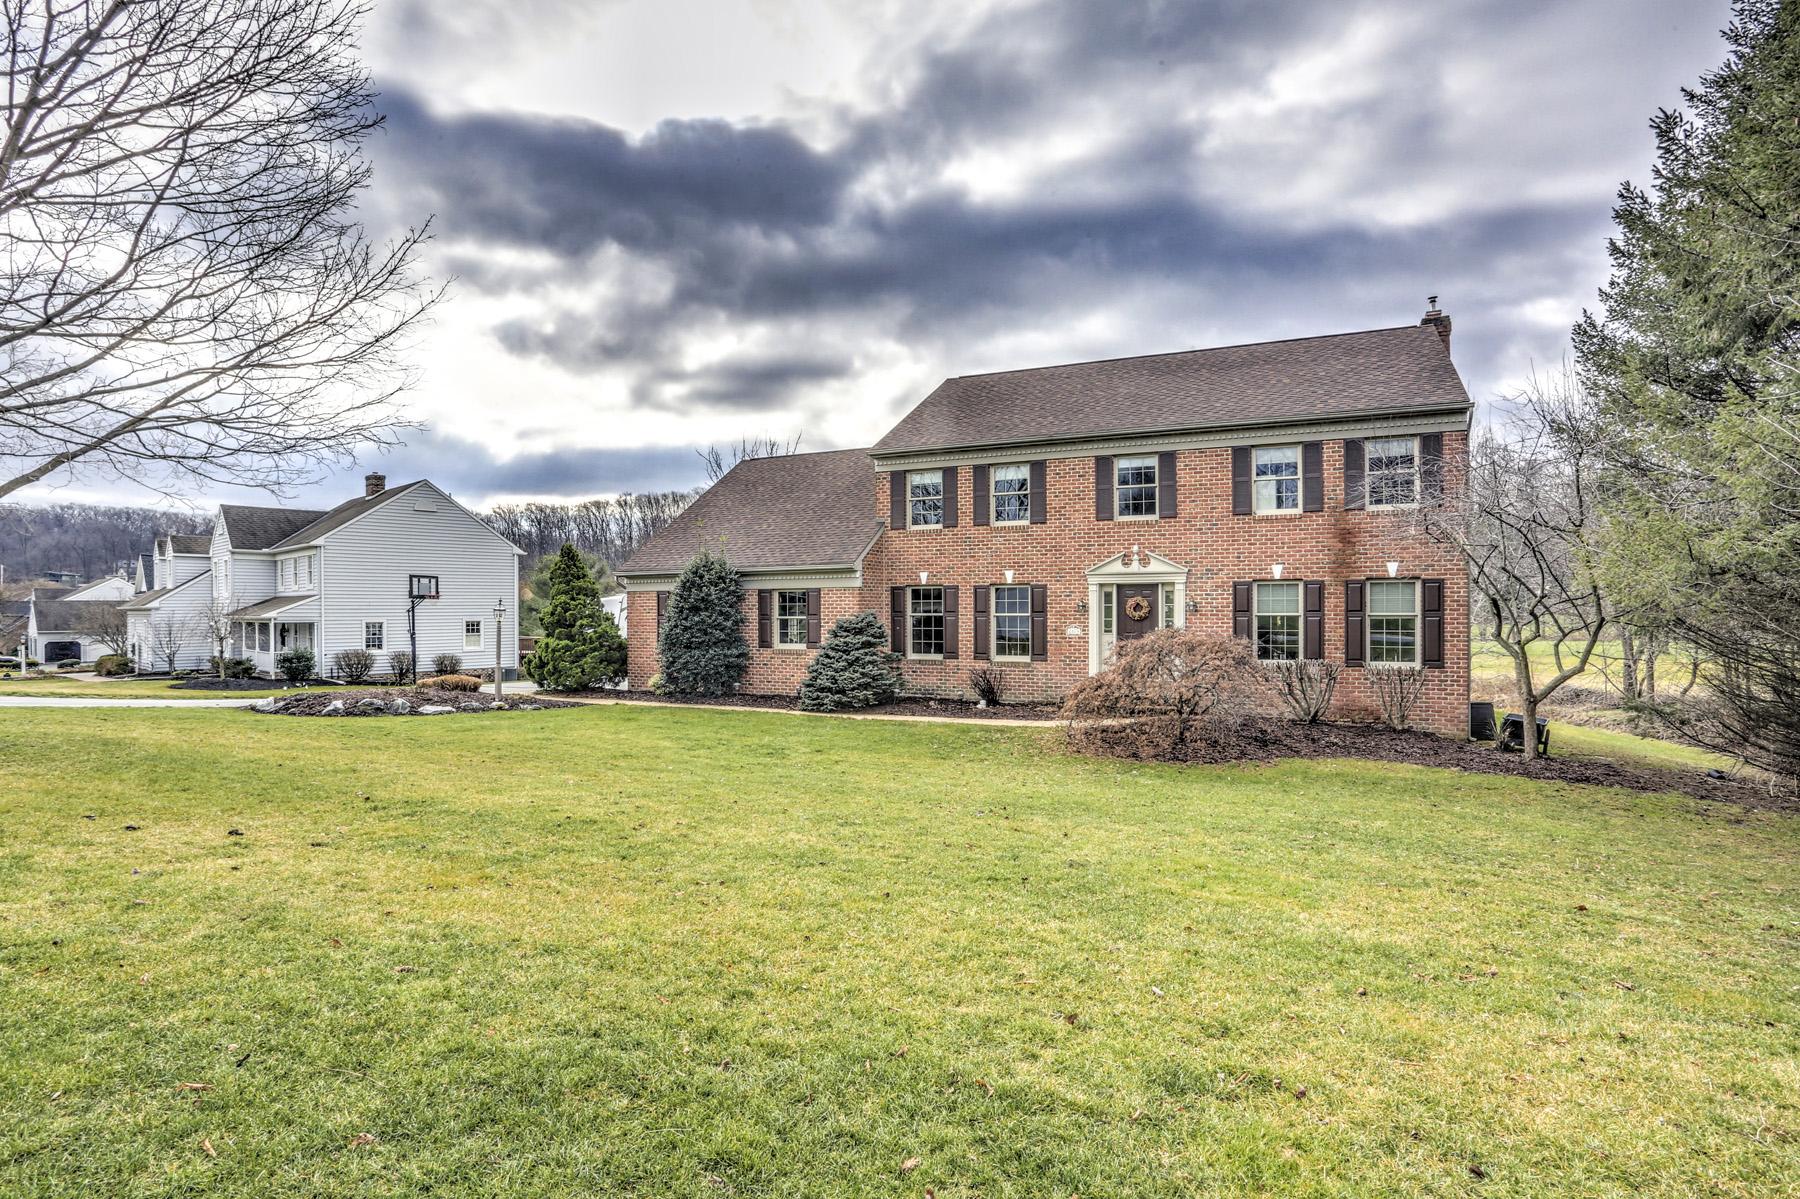 Single Family Home for Sale at School Lane Hills Estates 2874 Wimbledon Lane Lancaster, 17601 United States